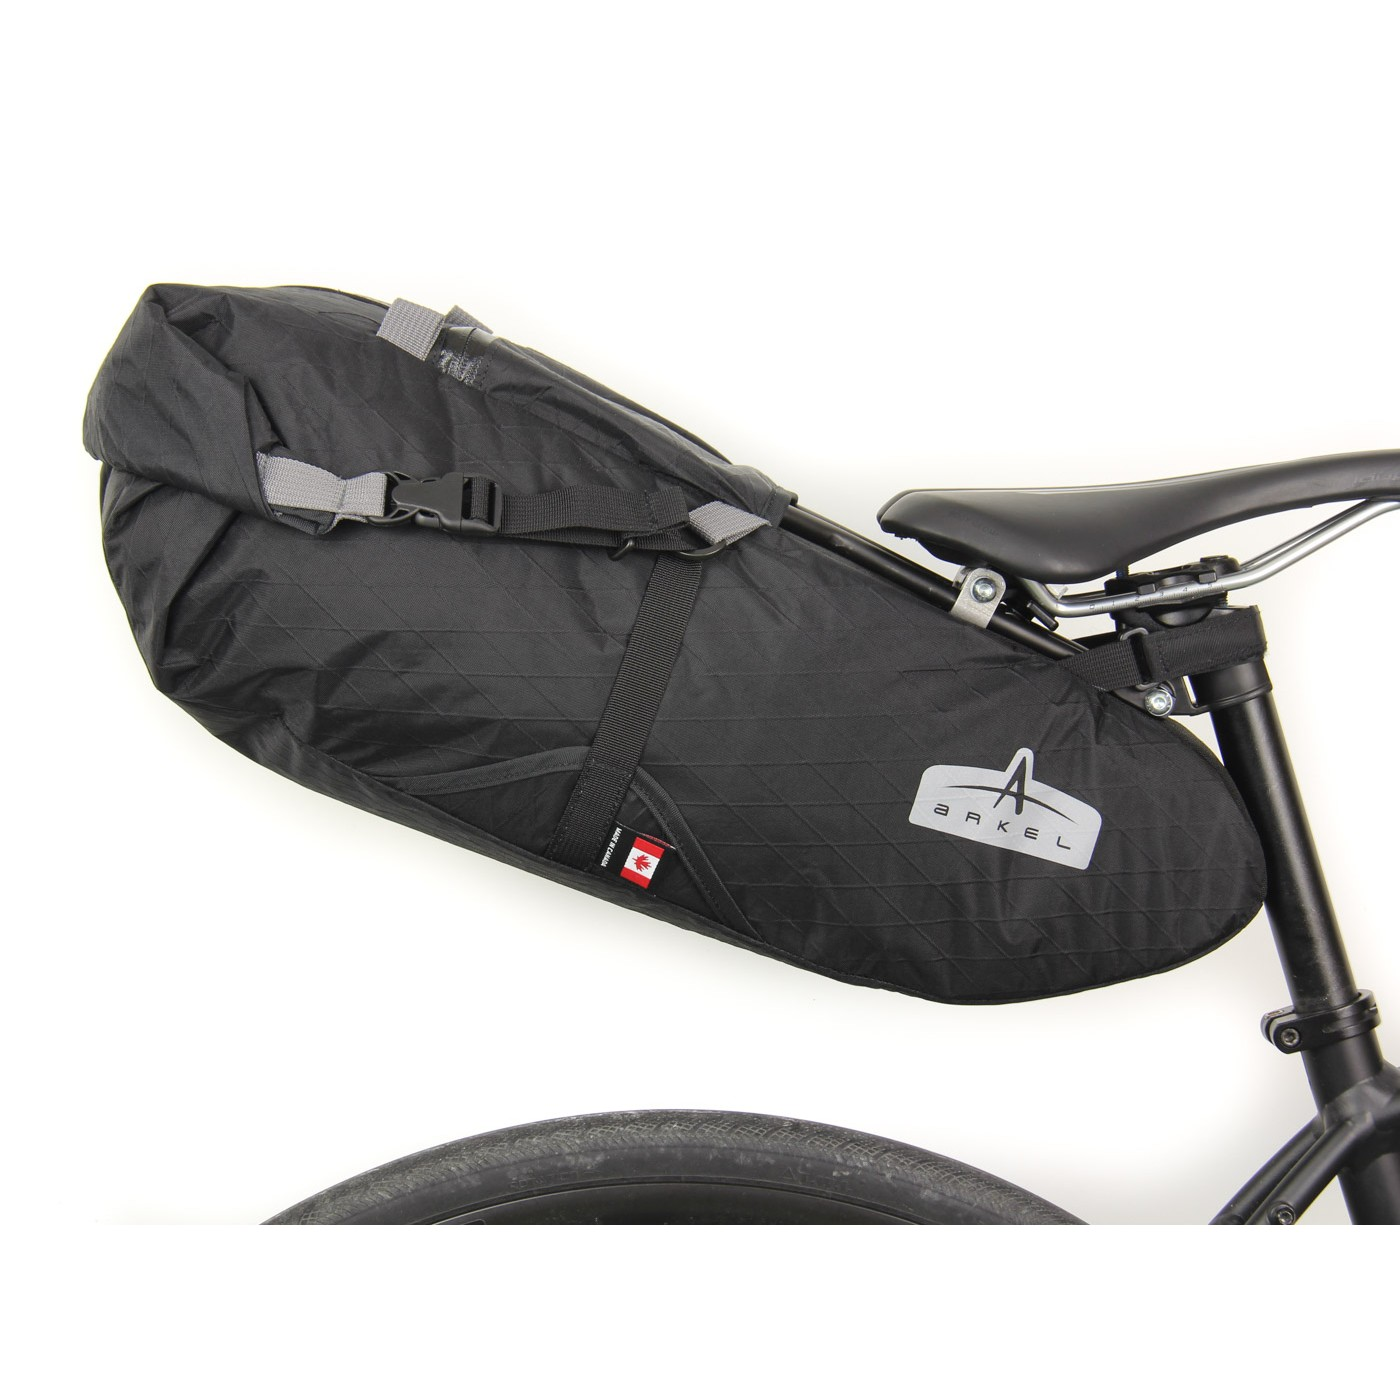 Arkel Seatpacker 15 Bikepacking Seat Bag